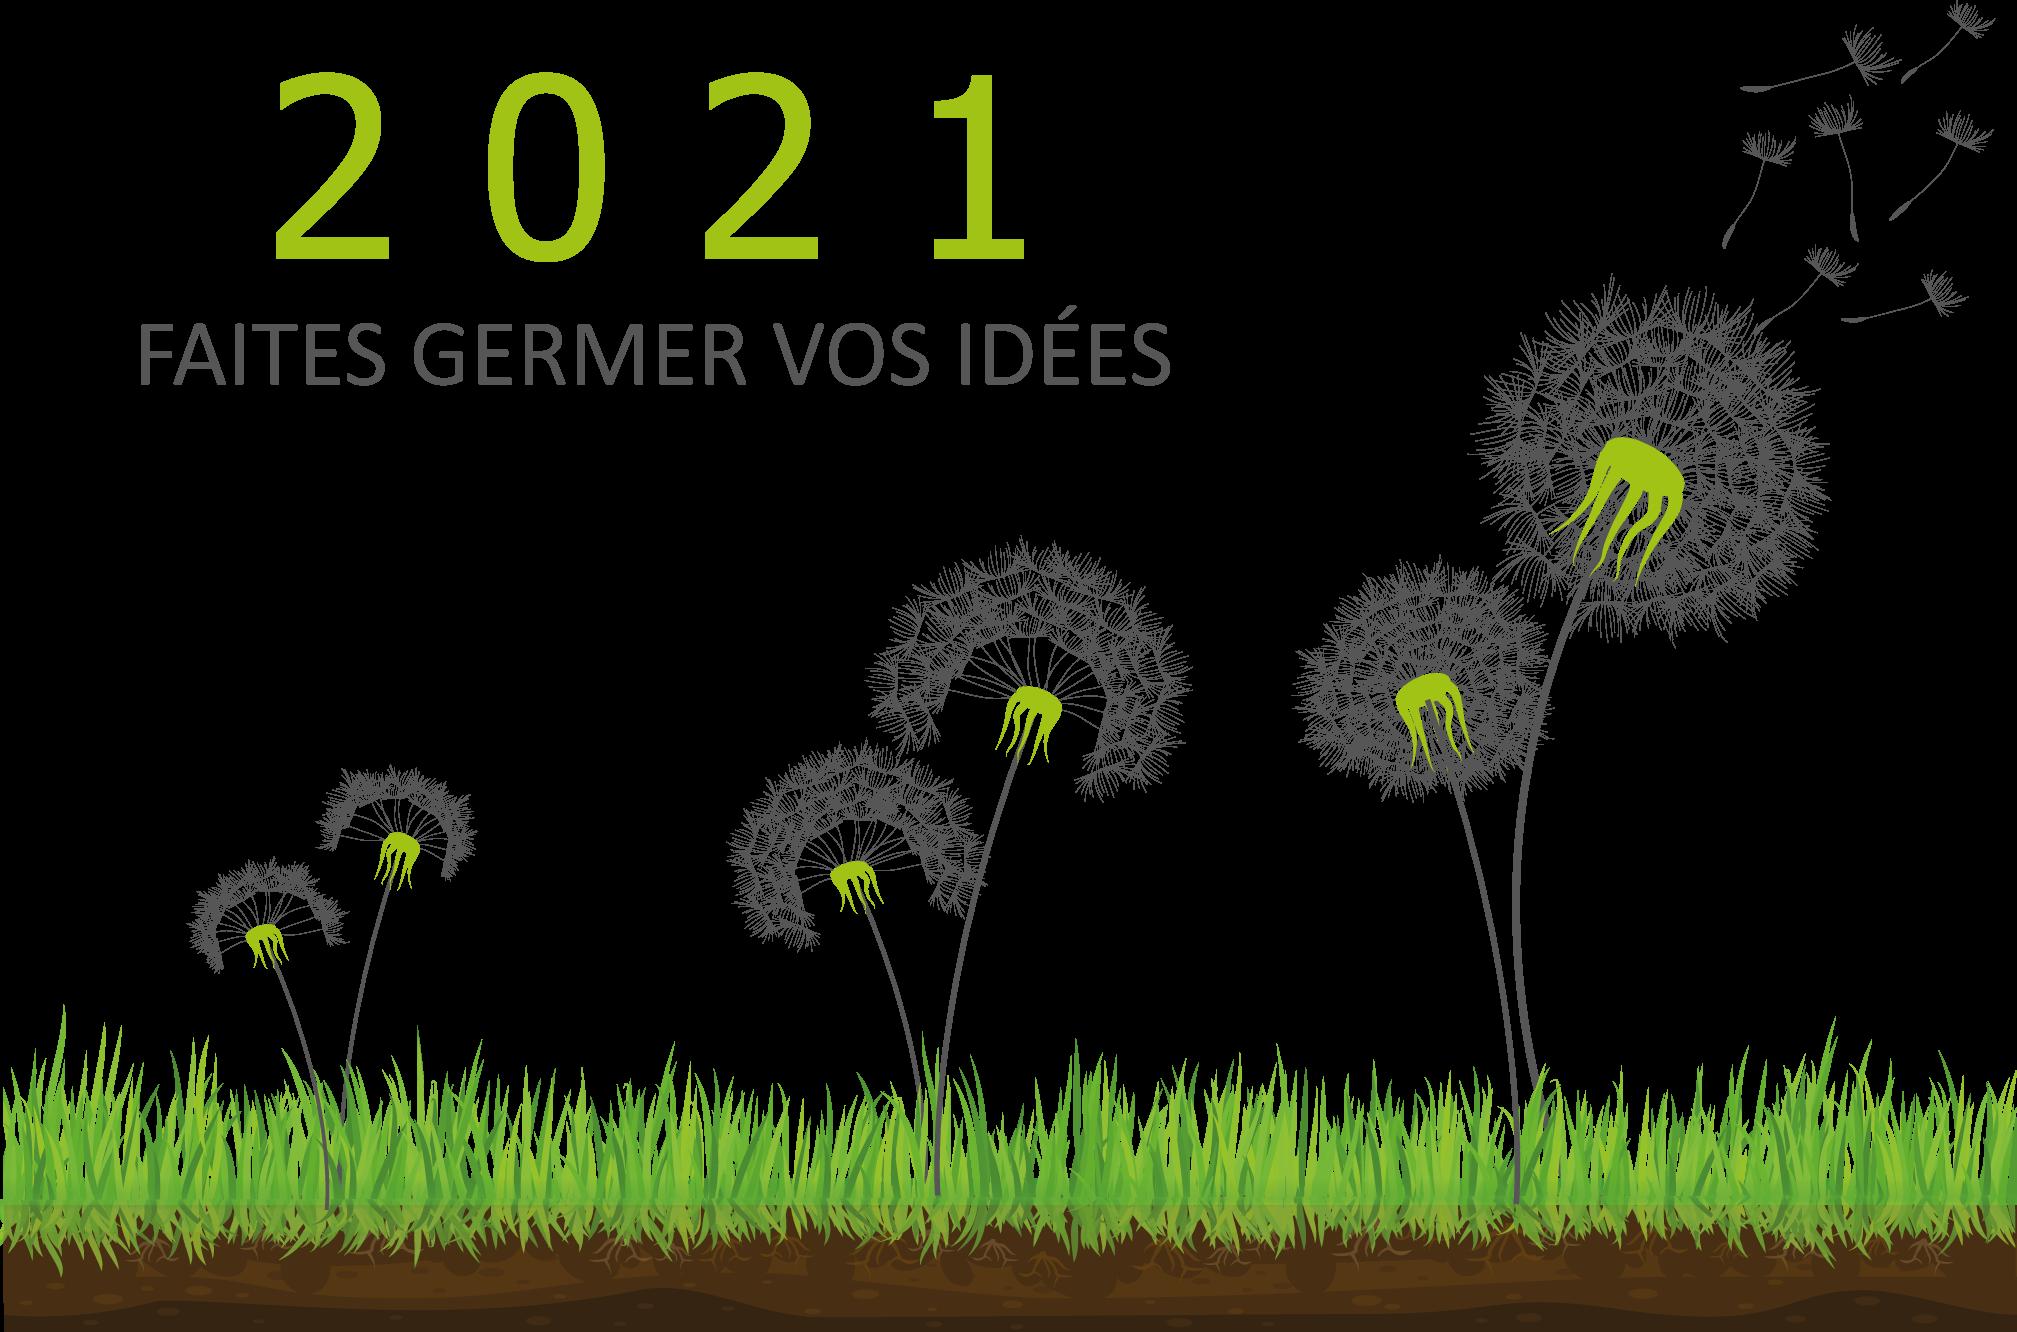 AZNETWORK - Bonne année 2021